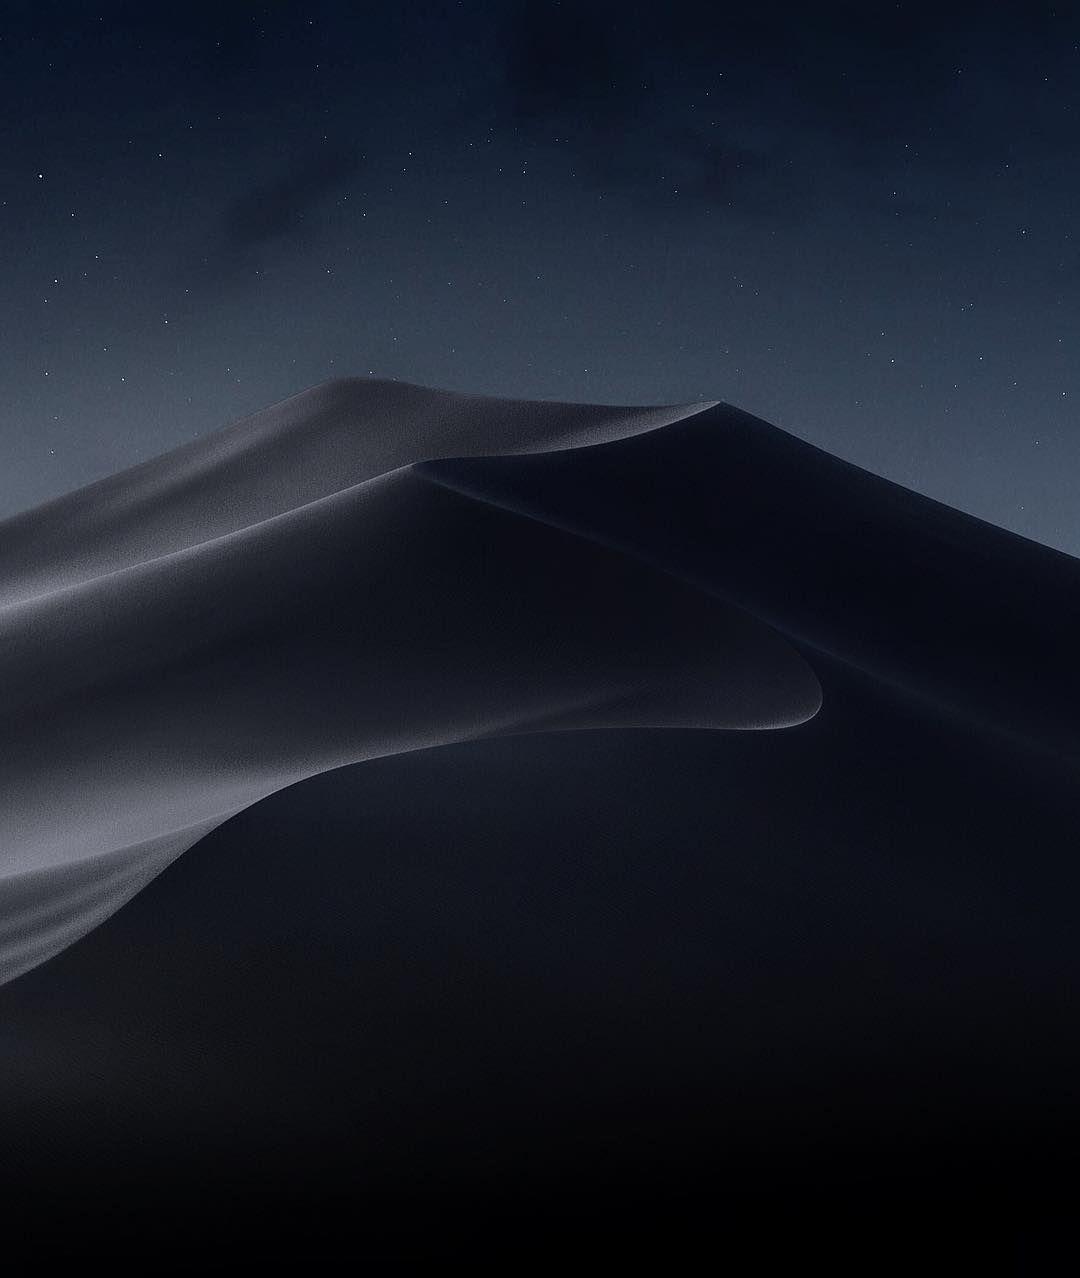 MacBook Next Dark Mode Wallpaper. Yes Or No